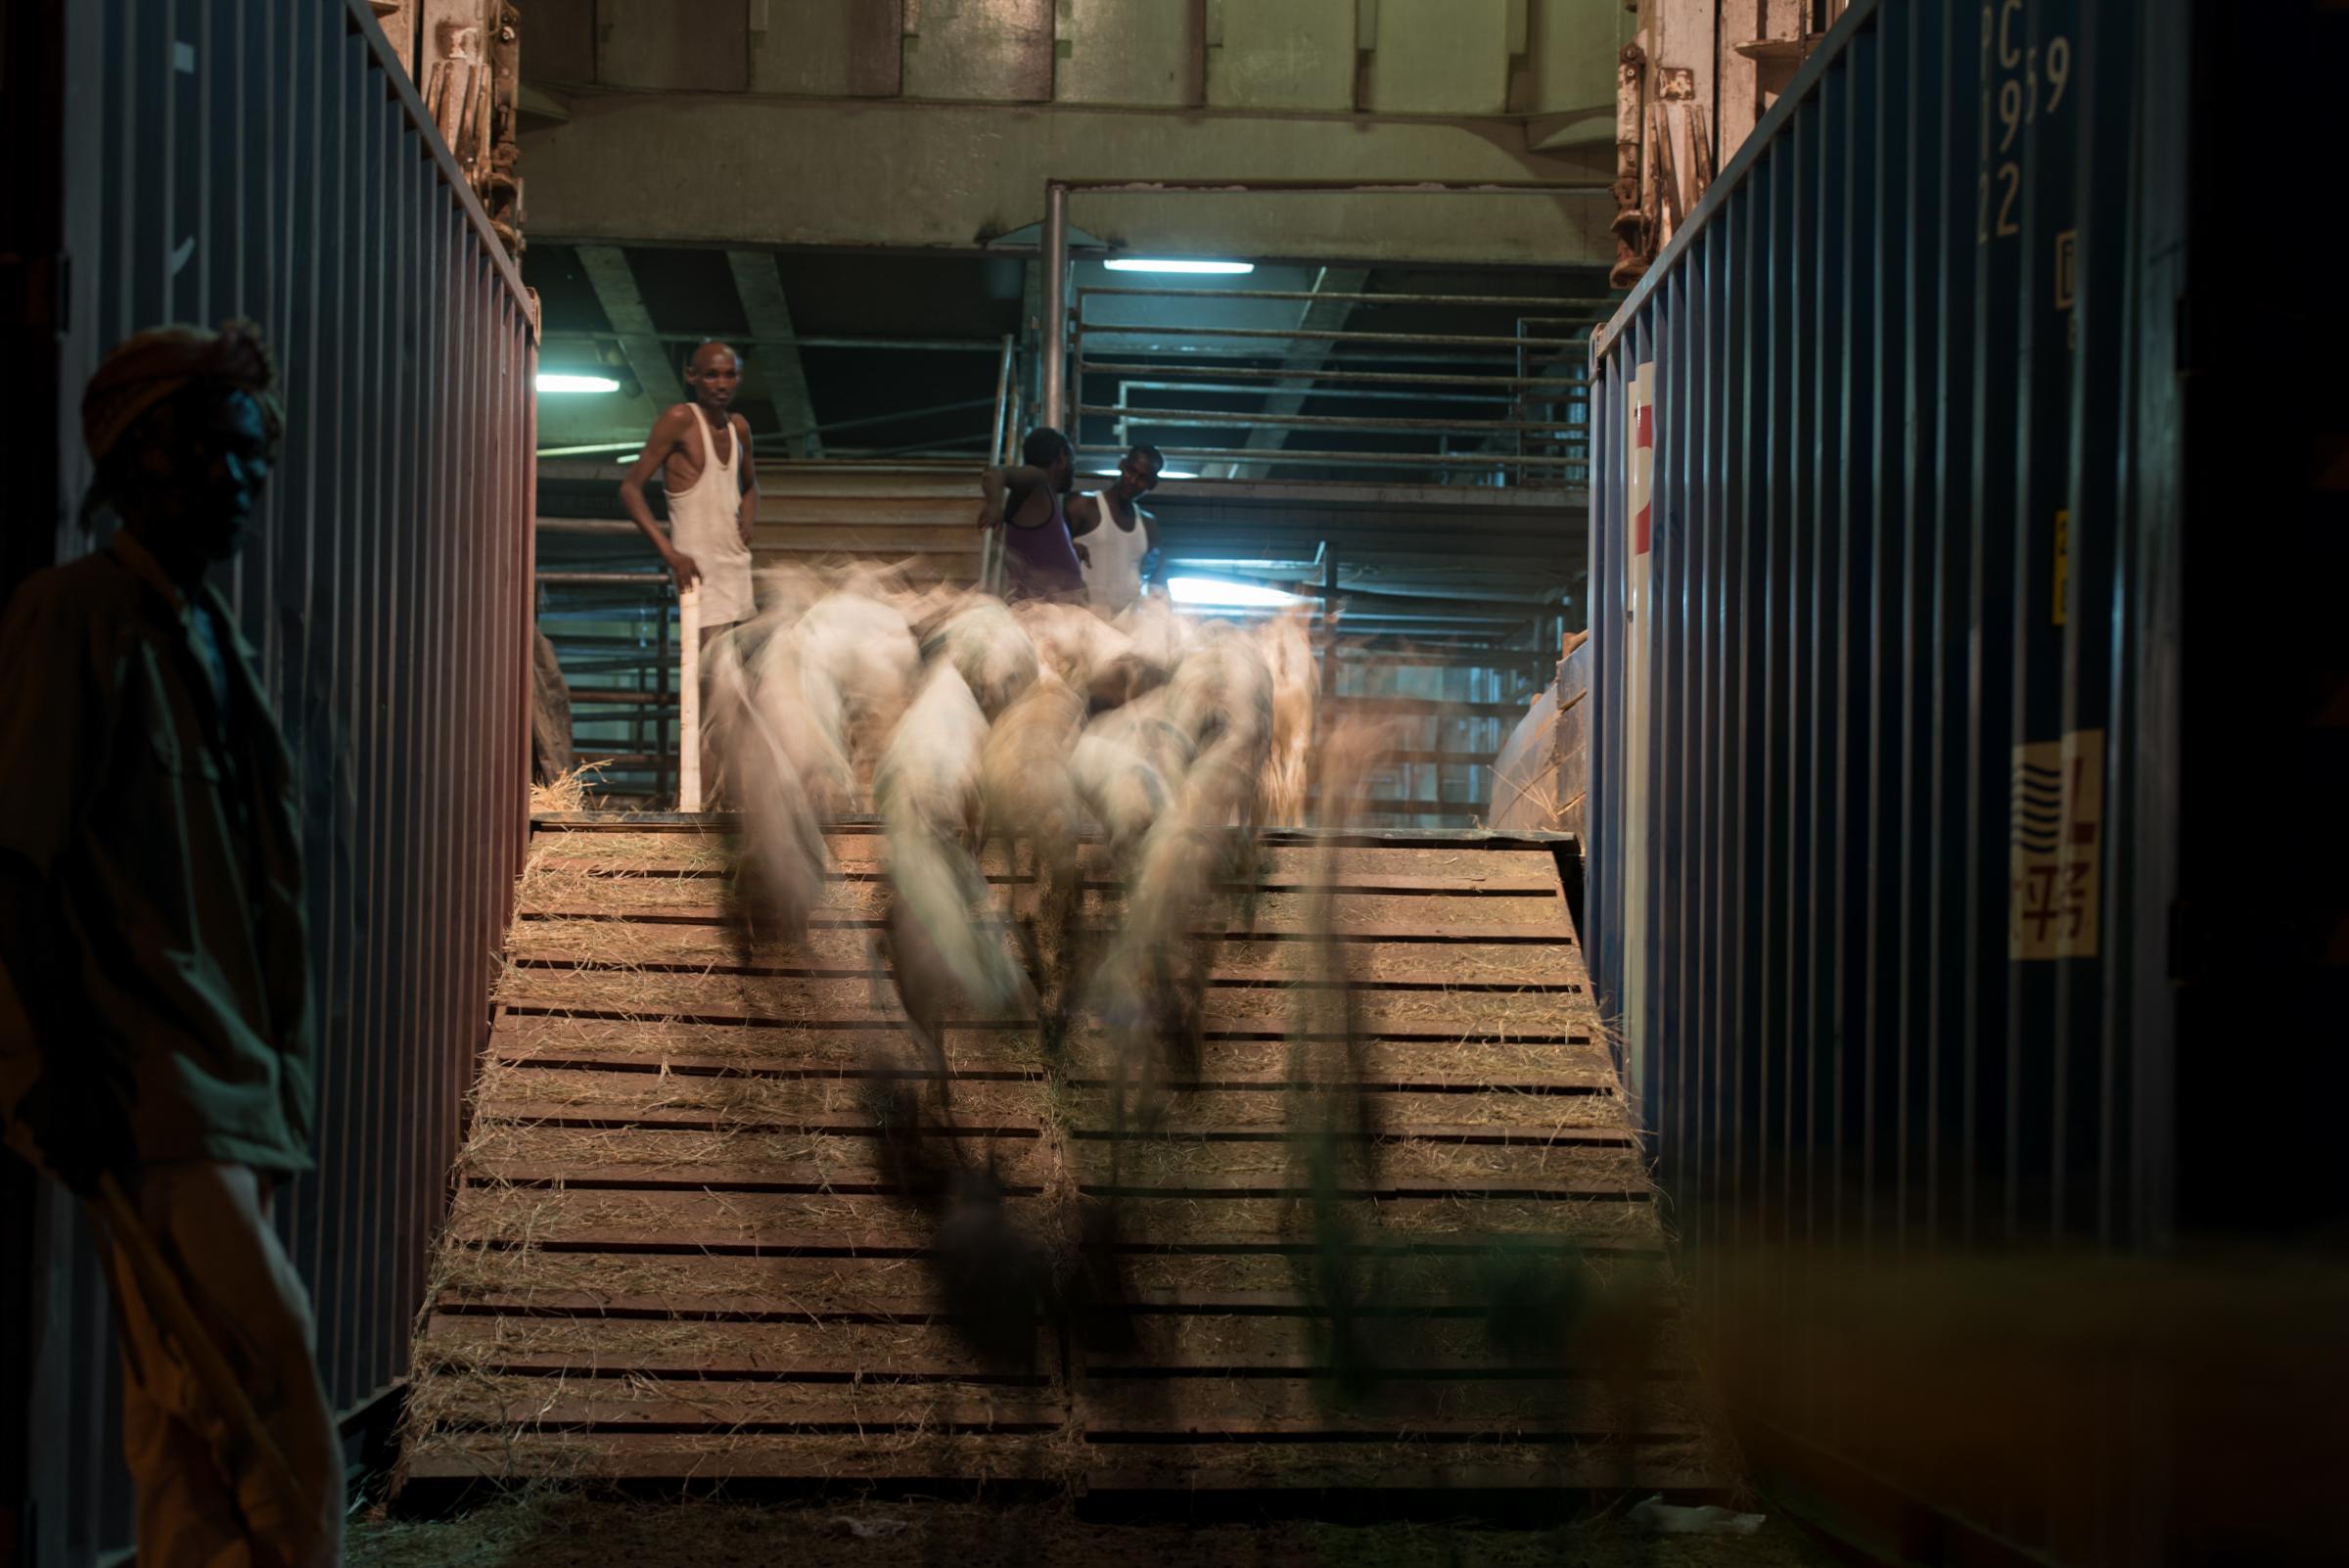 Somalia and Somaliland export livestock to Saudi Arabia to